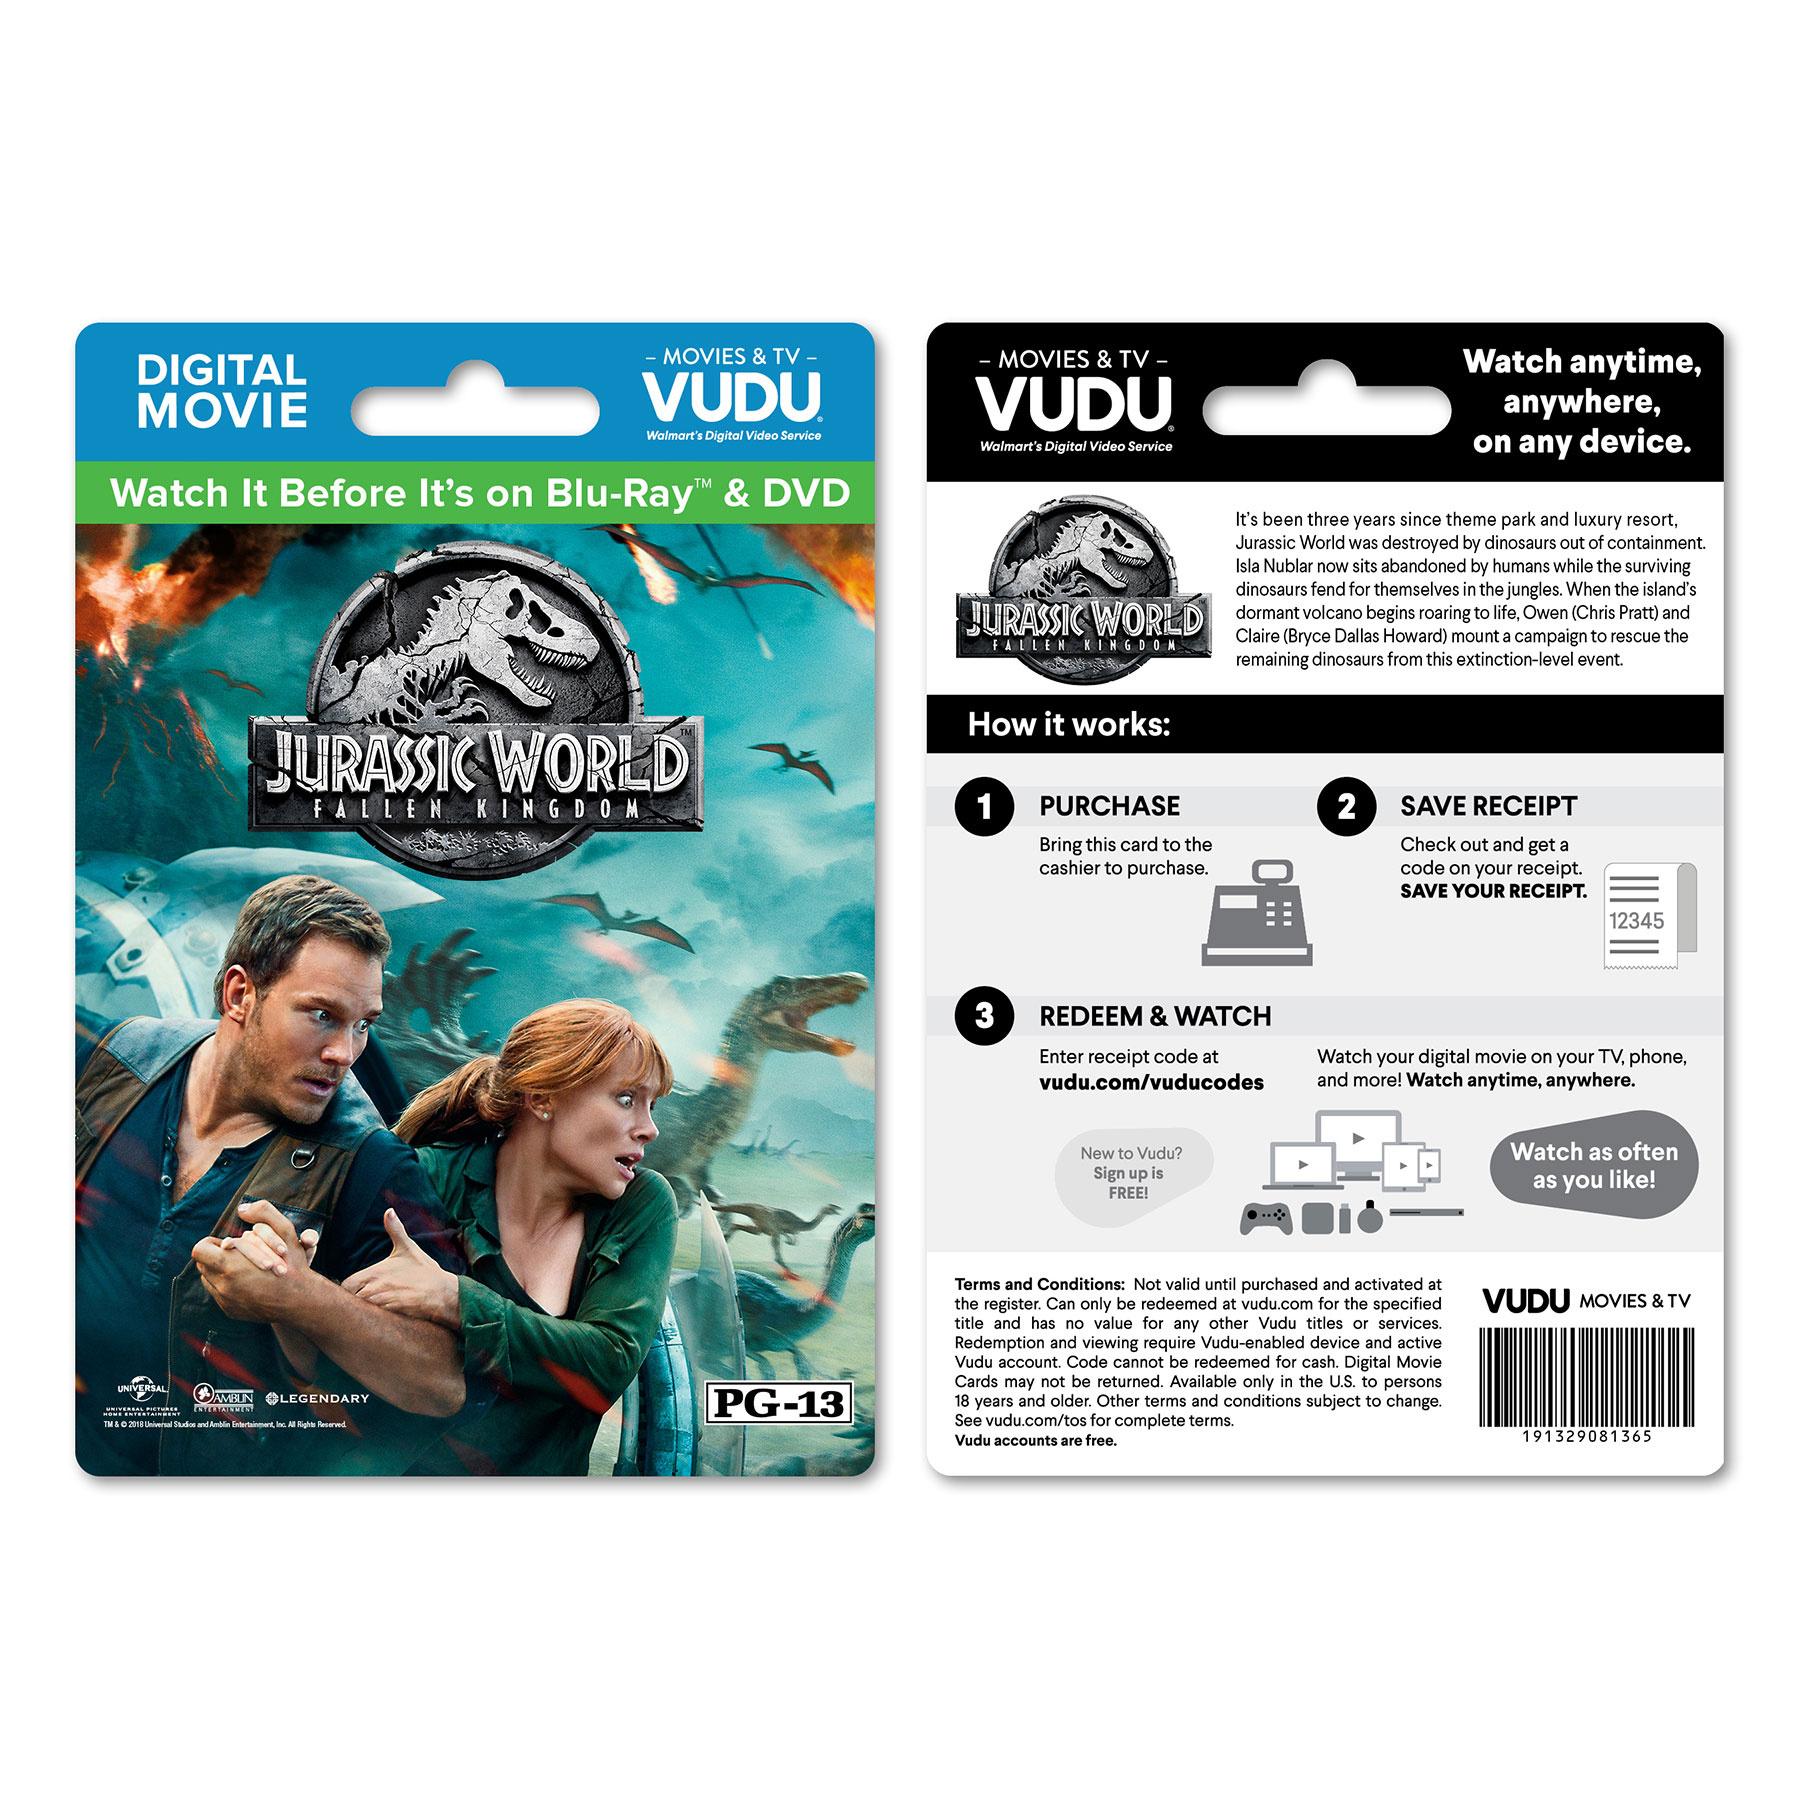 Jurassic World Walmart Digital Card